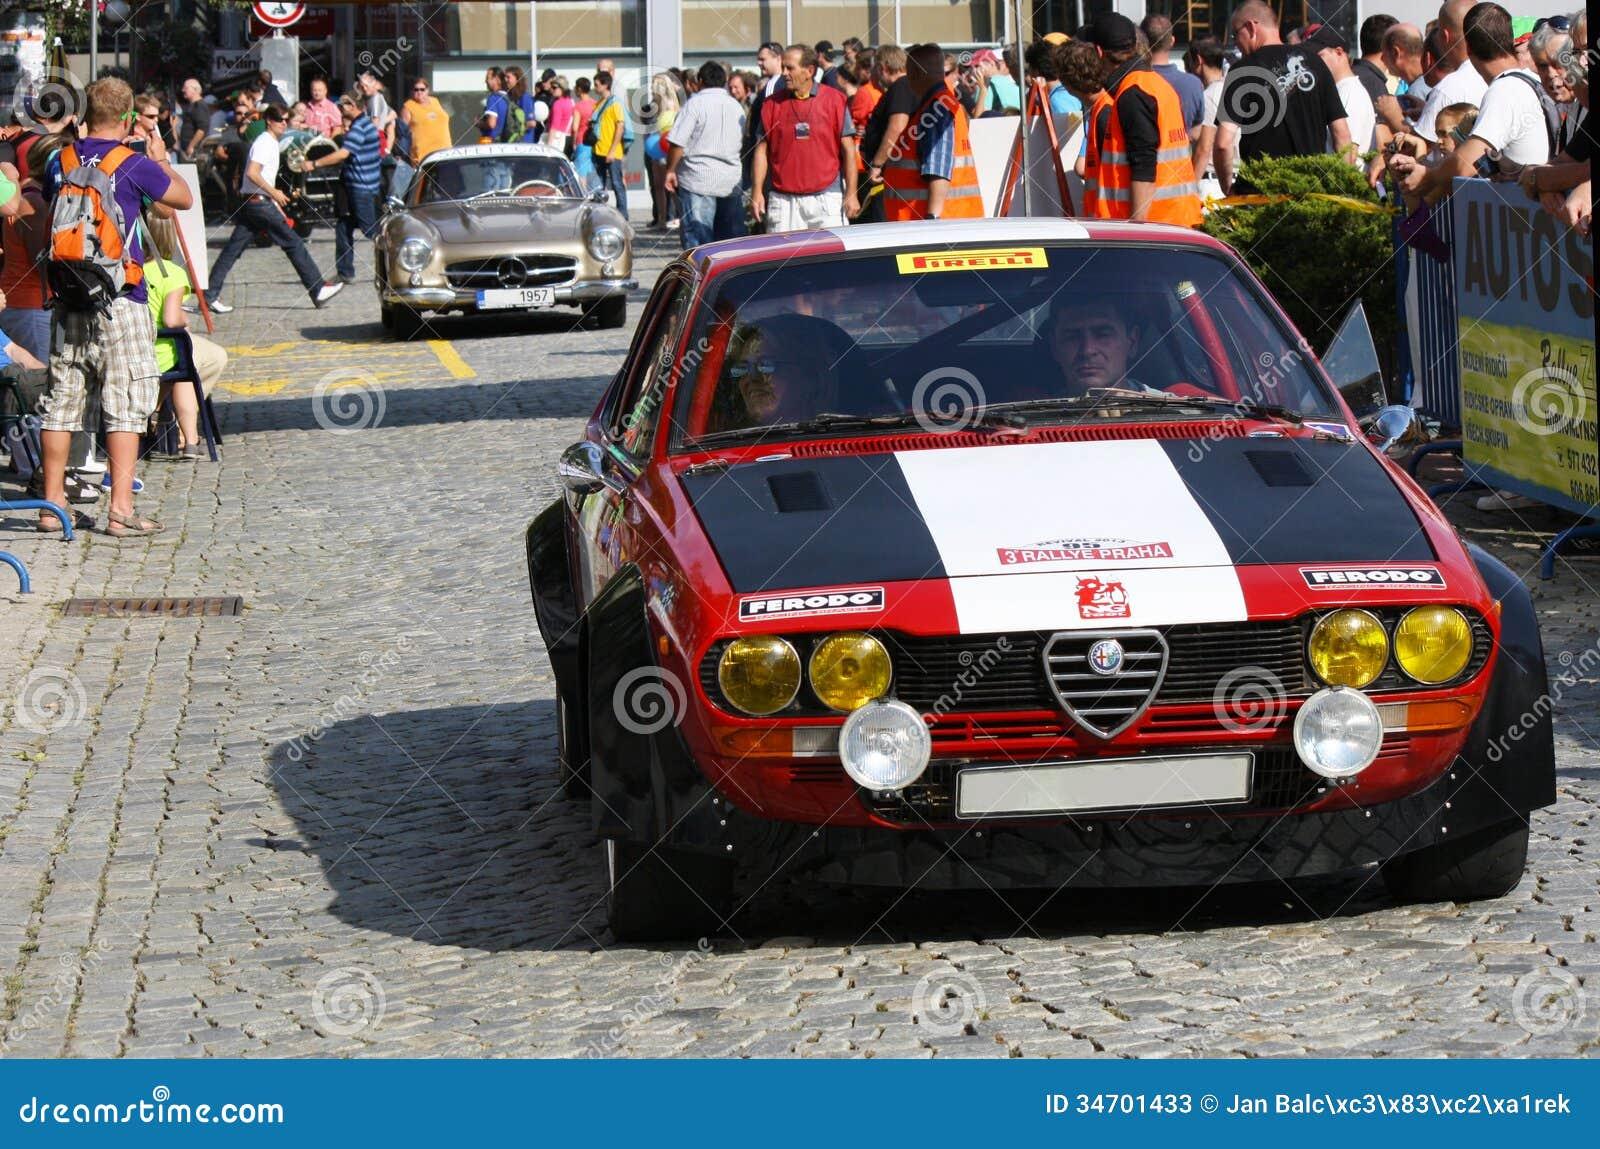 Rally Motor Credit >> Alfa Romeo GTV6 Editorial Stock Photo - Image: 34701433